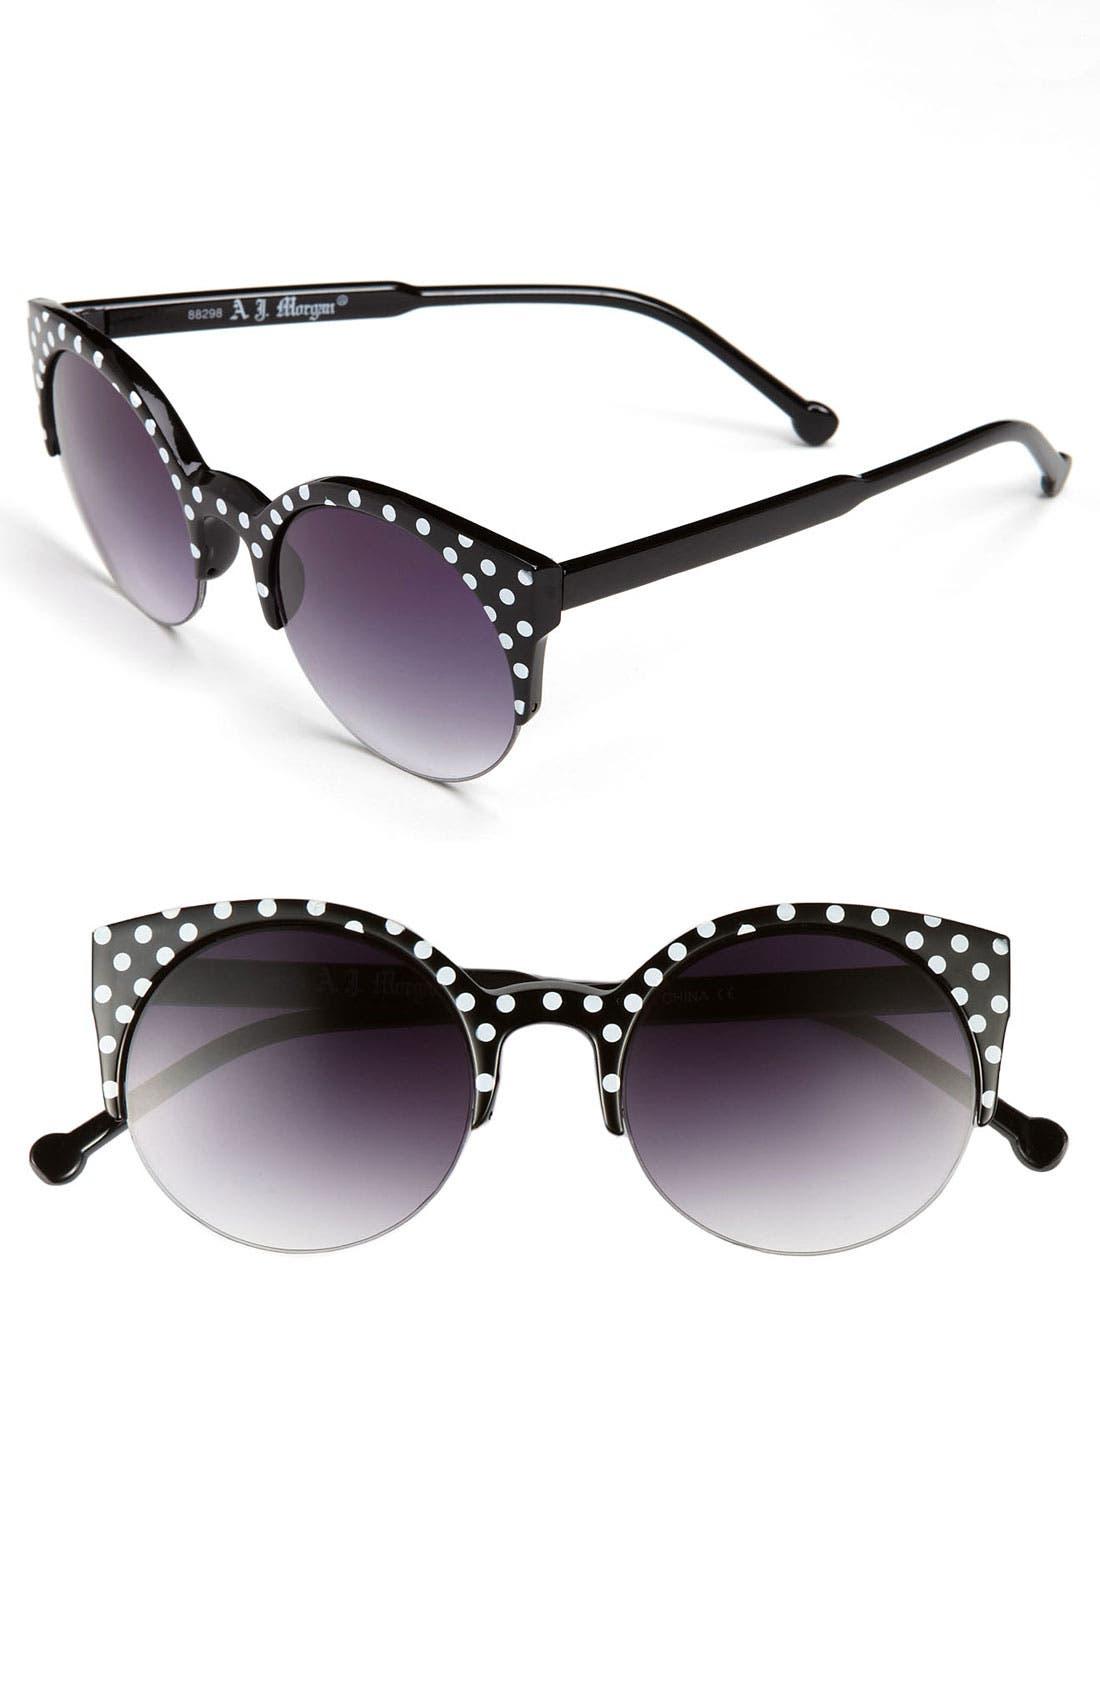 Main Image - A.J. Morgan 52mm Retro Sunglasses